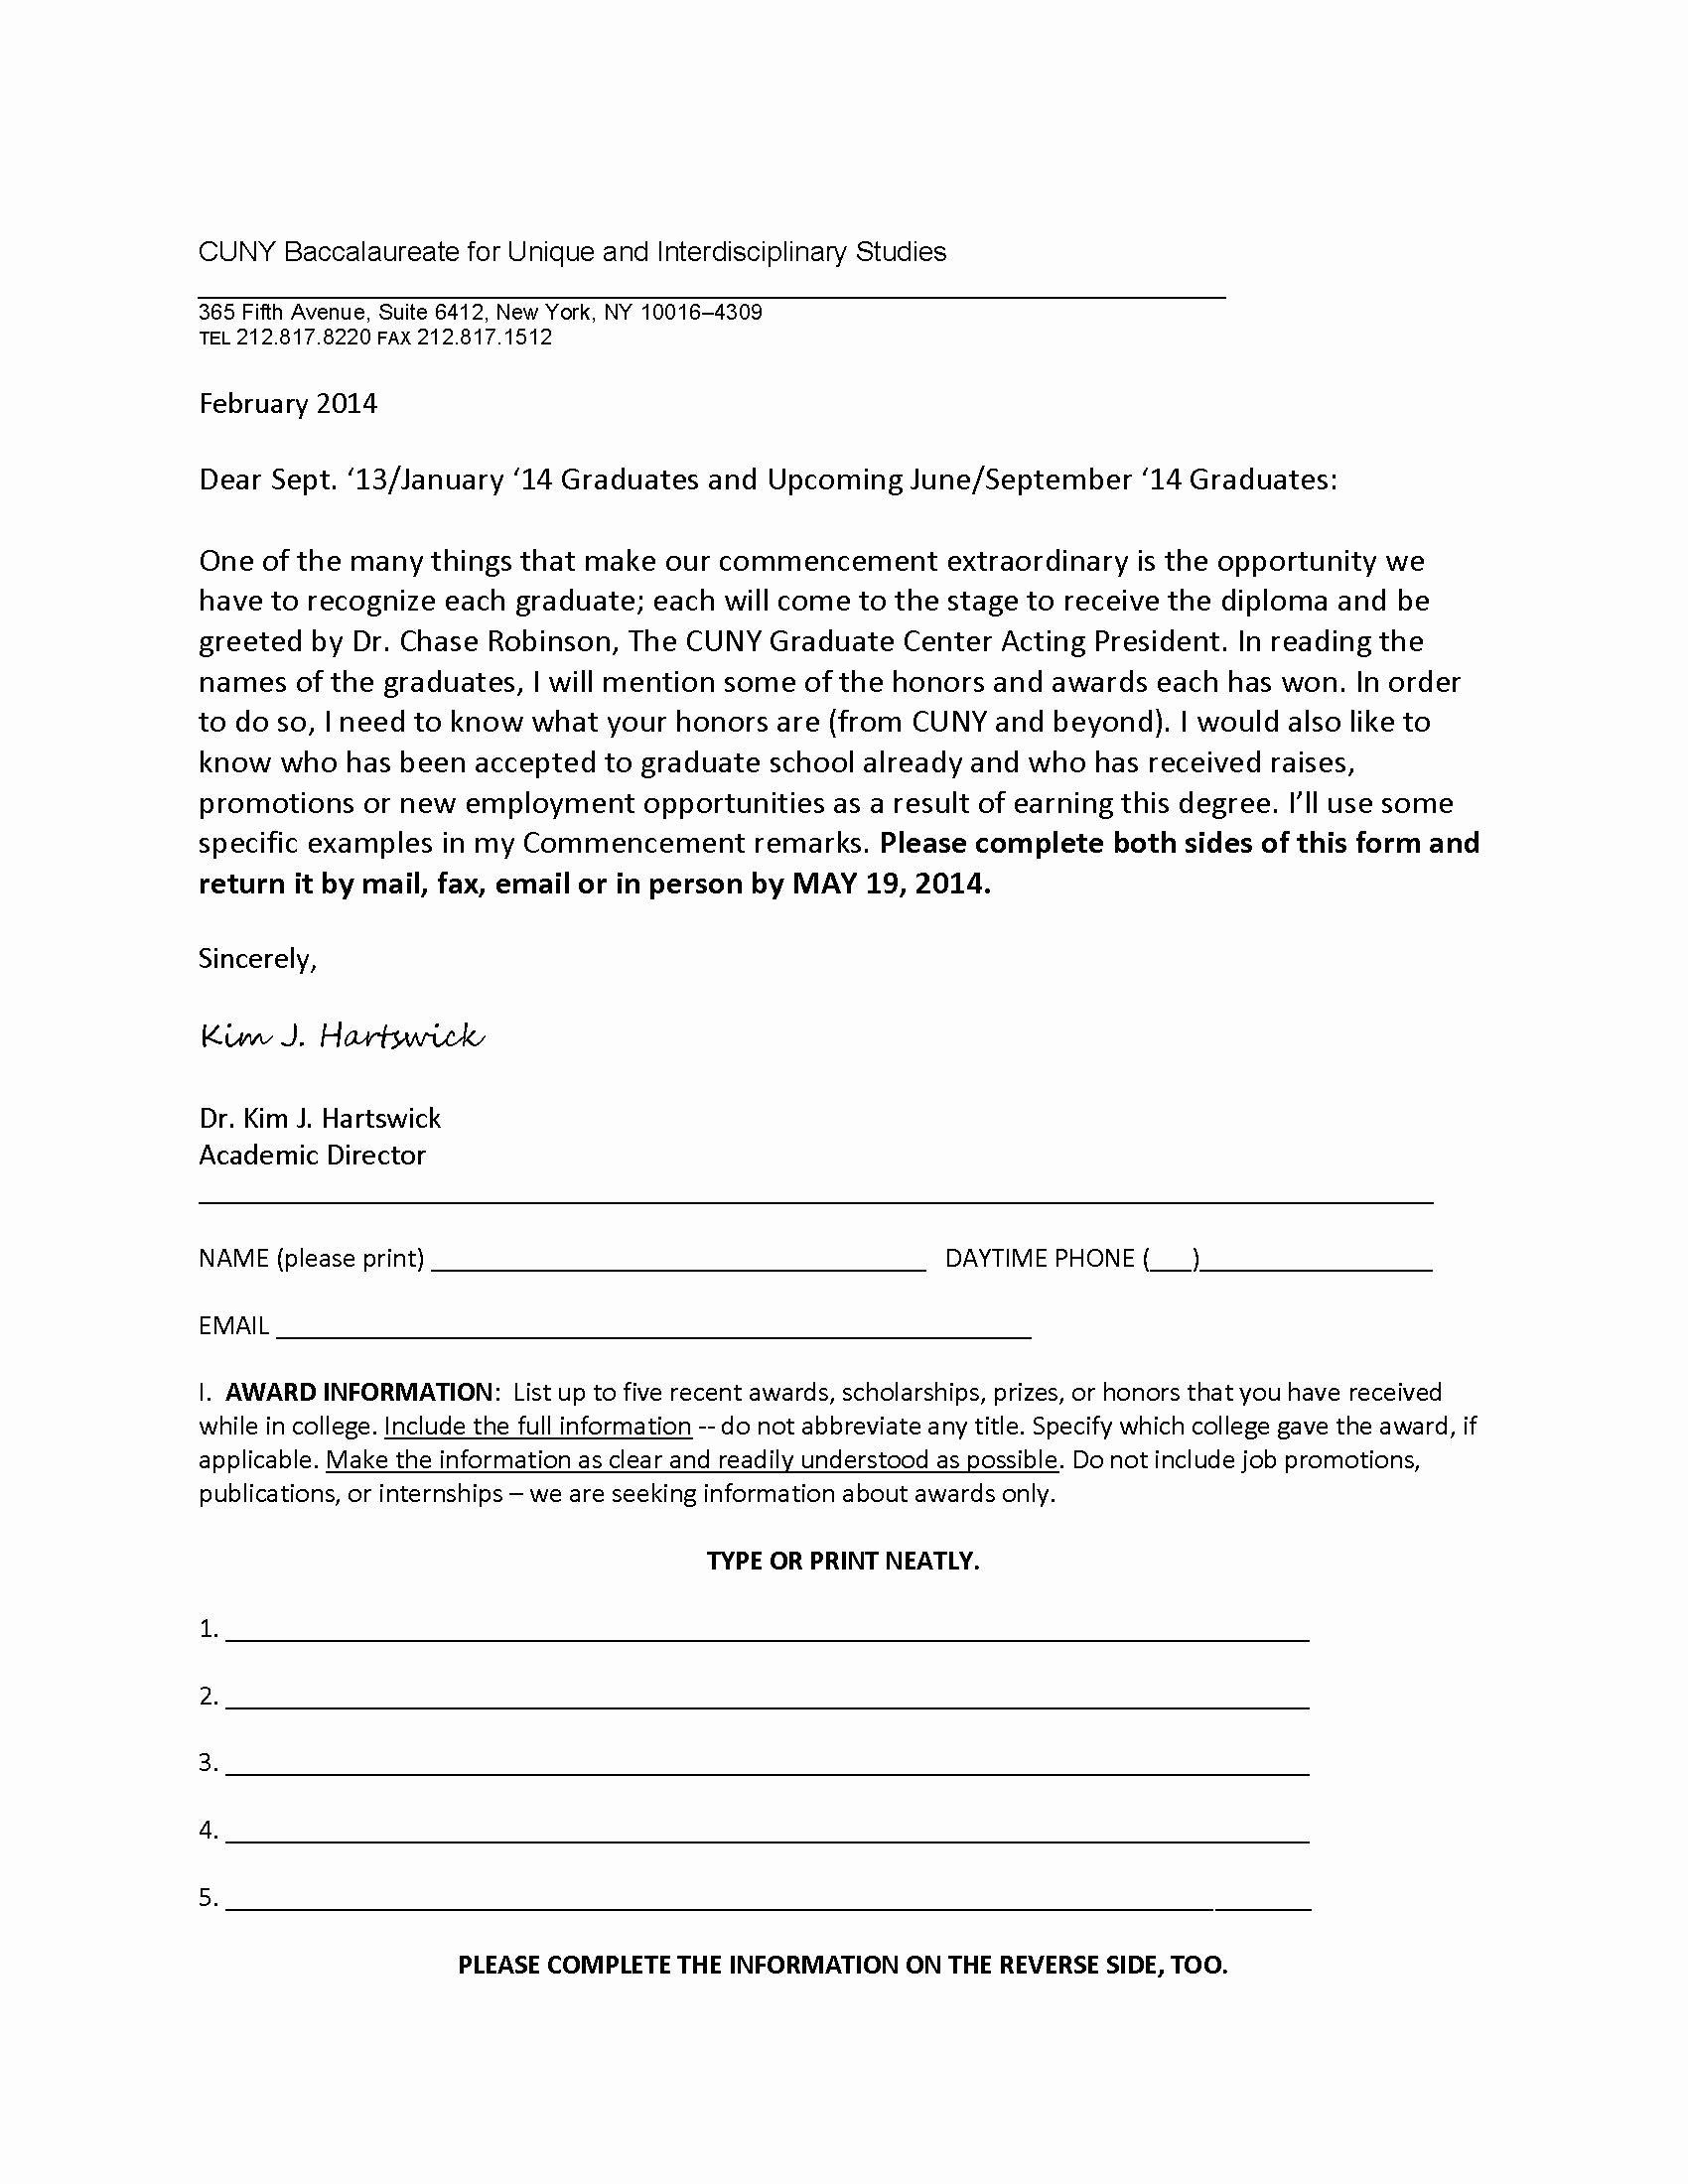 Letter for Graduation Unique Graduation Ceremony Invitation Letter